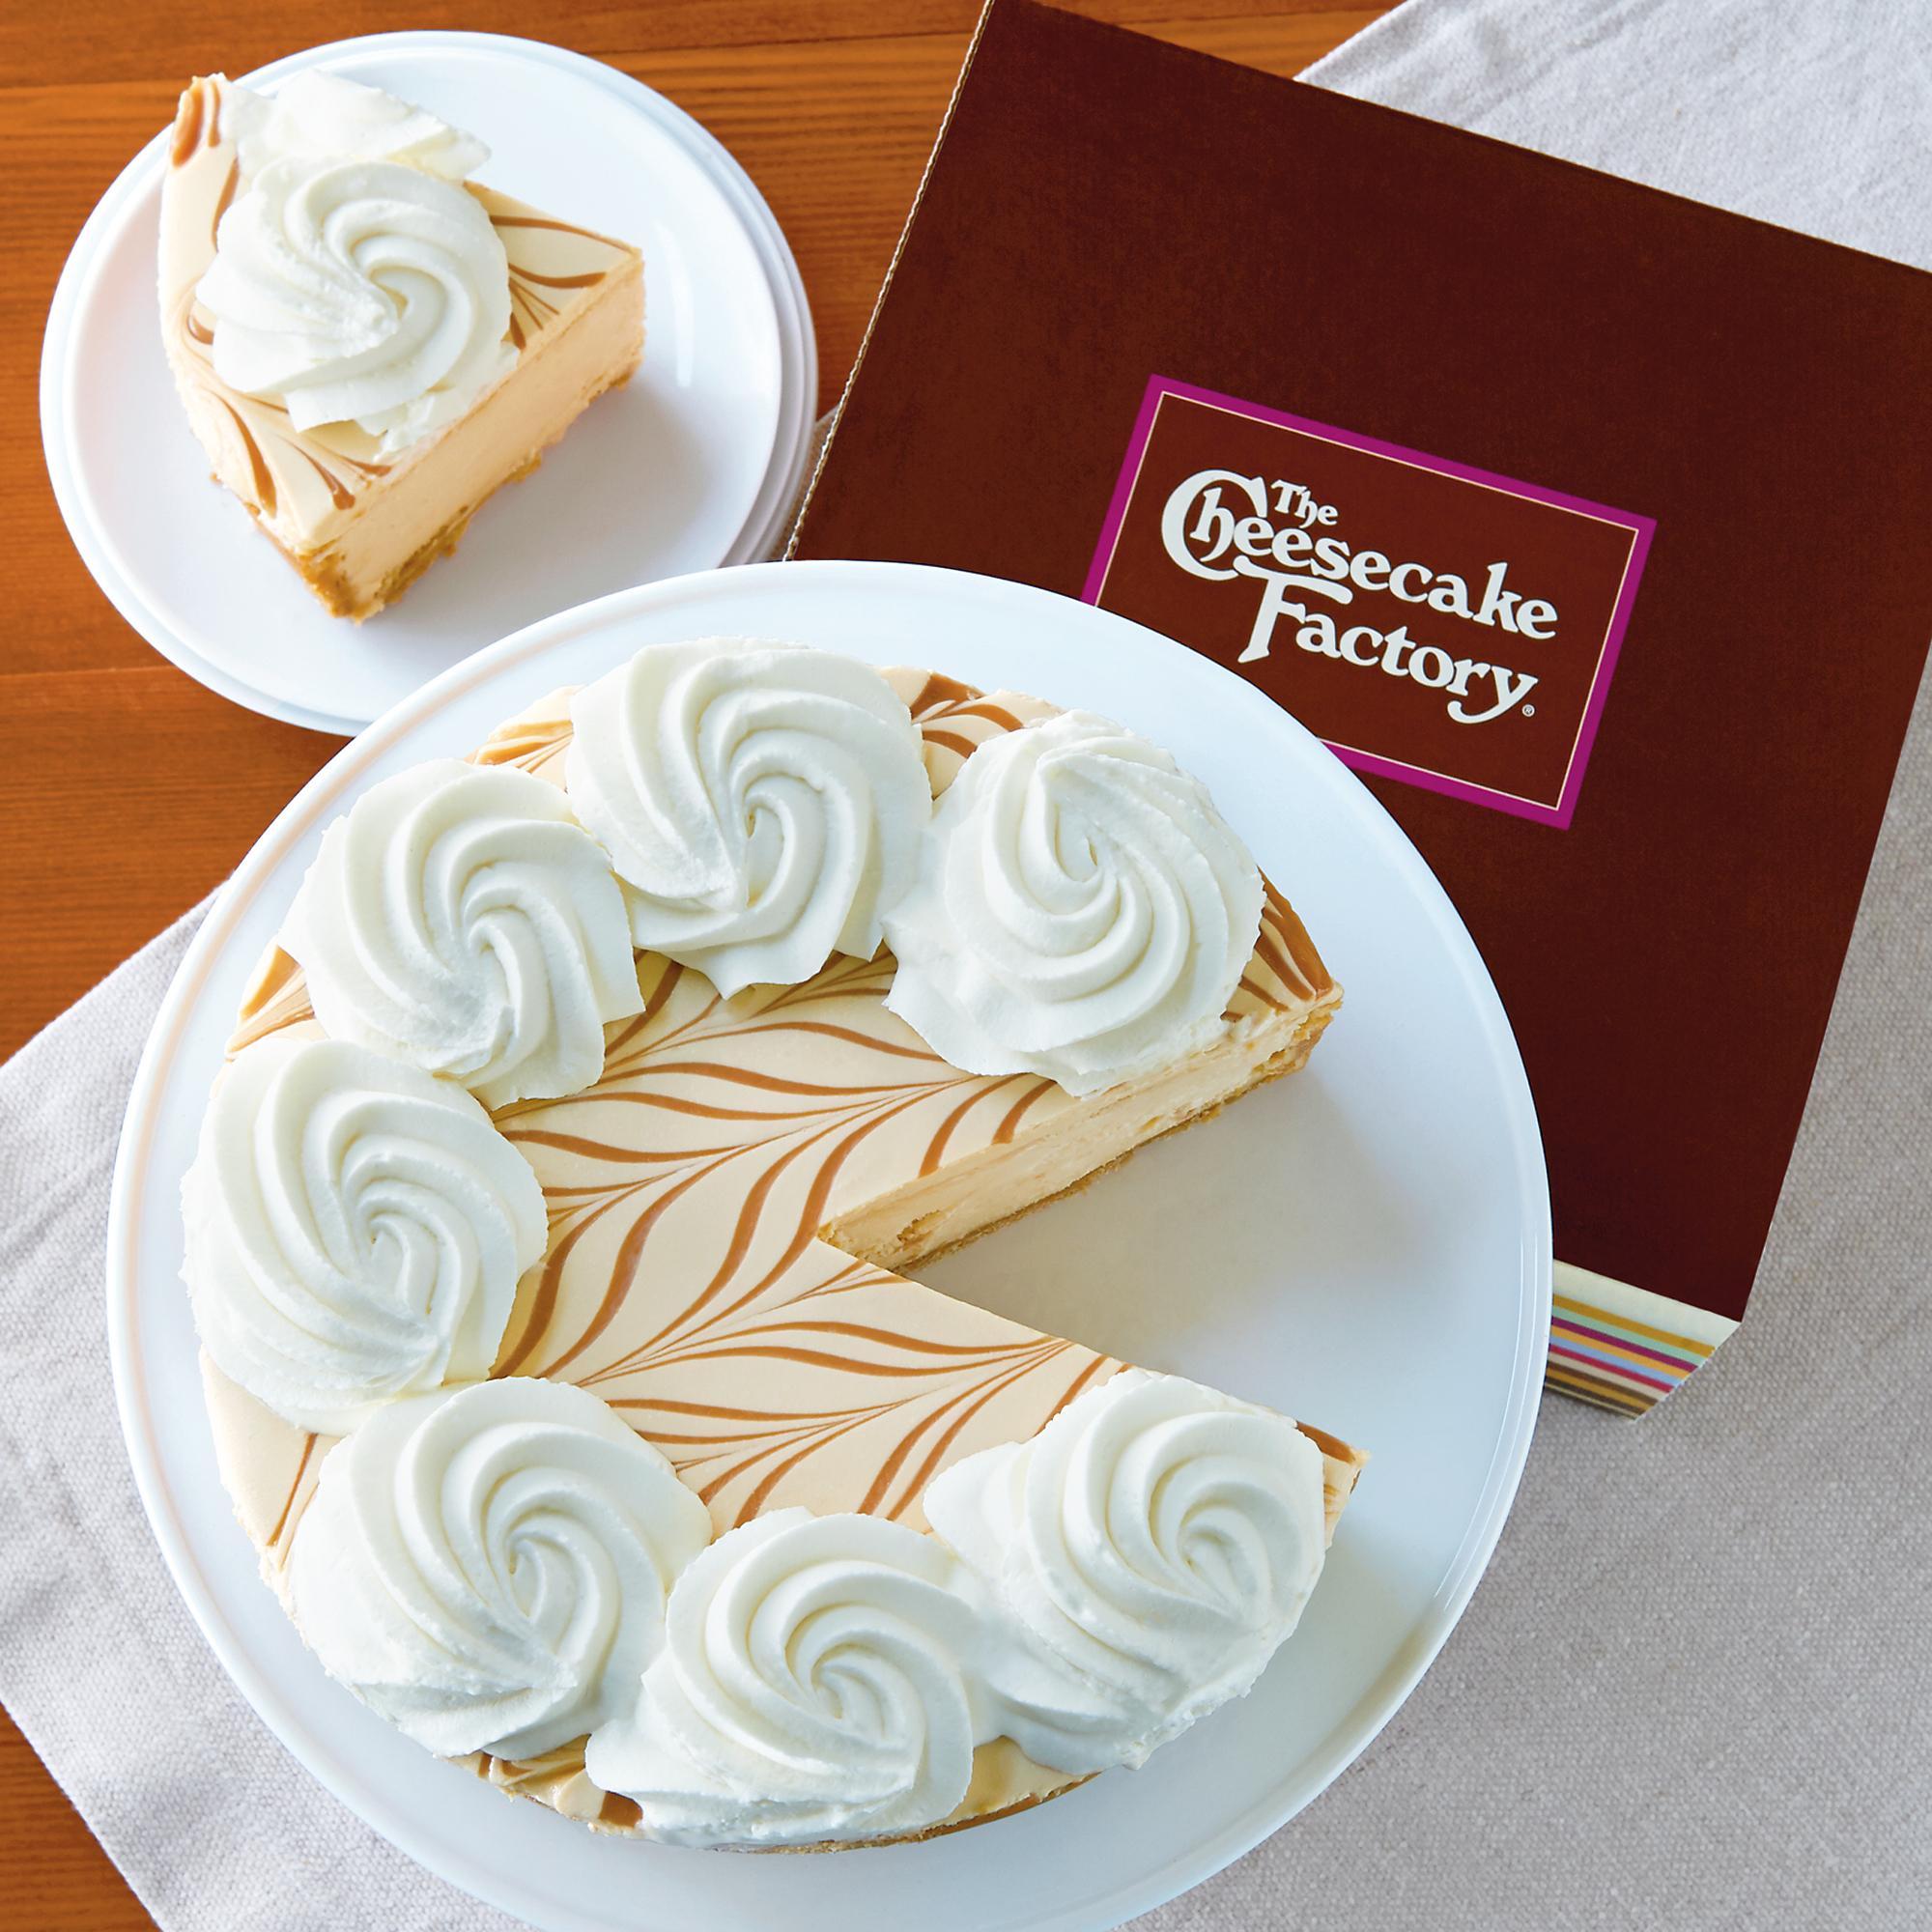 The Cheesecake Factory Dulce de Leche Caramel Cheesecake